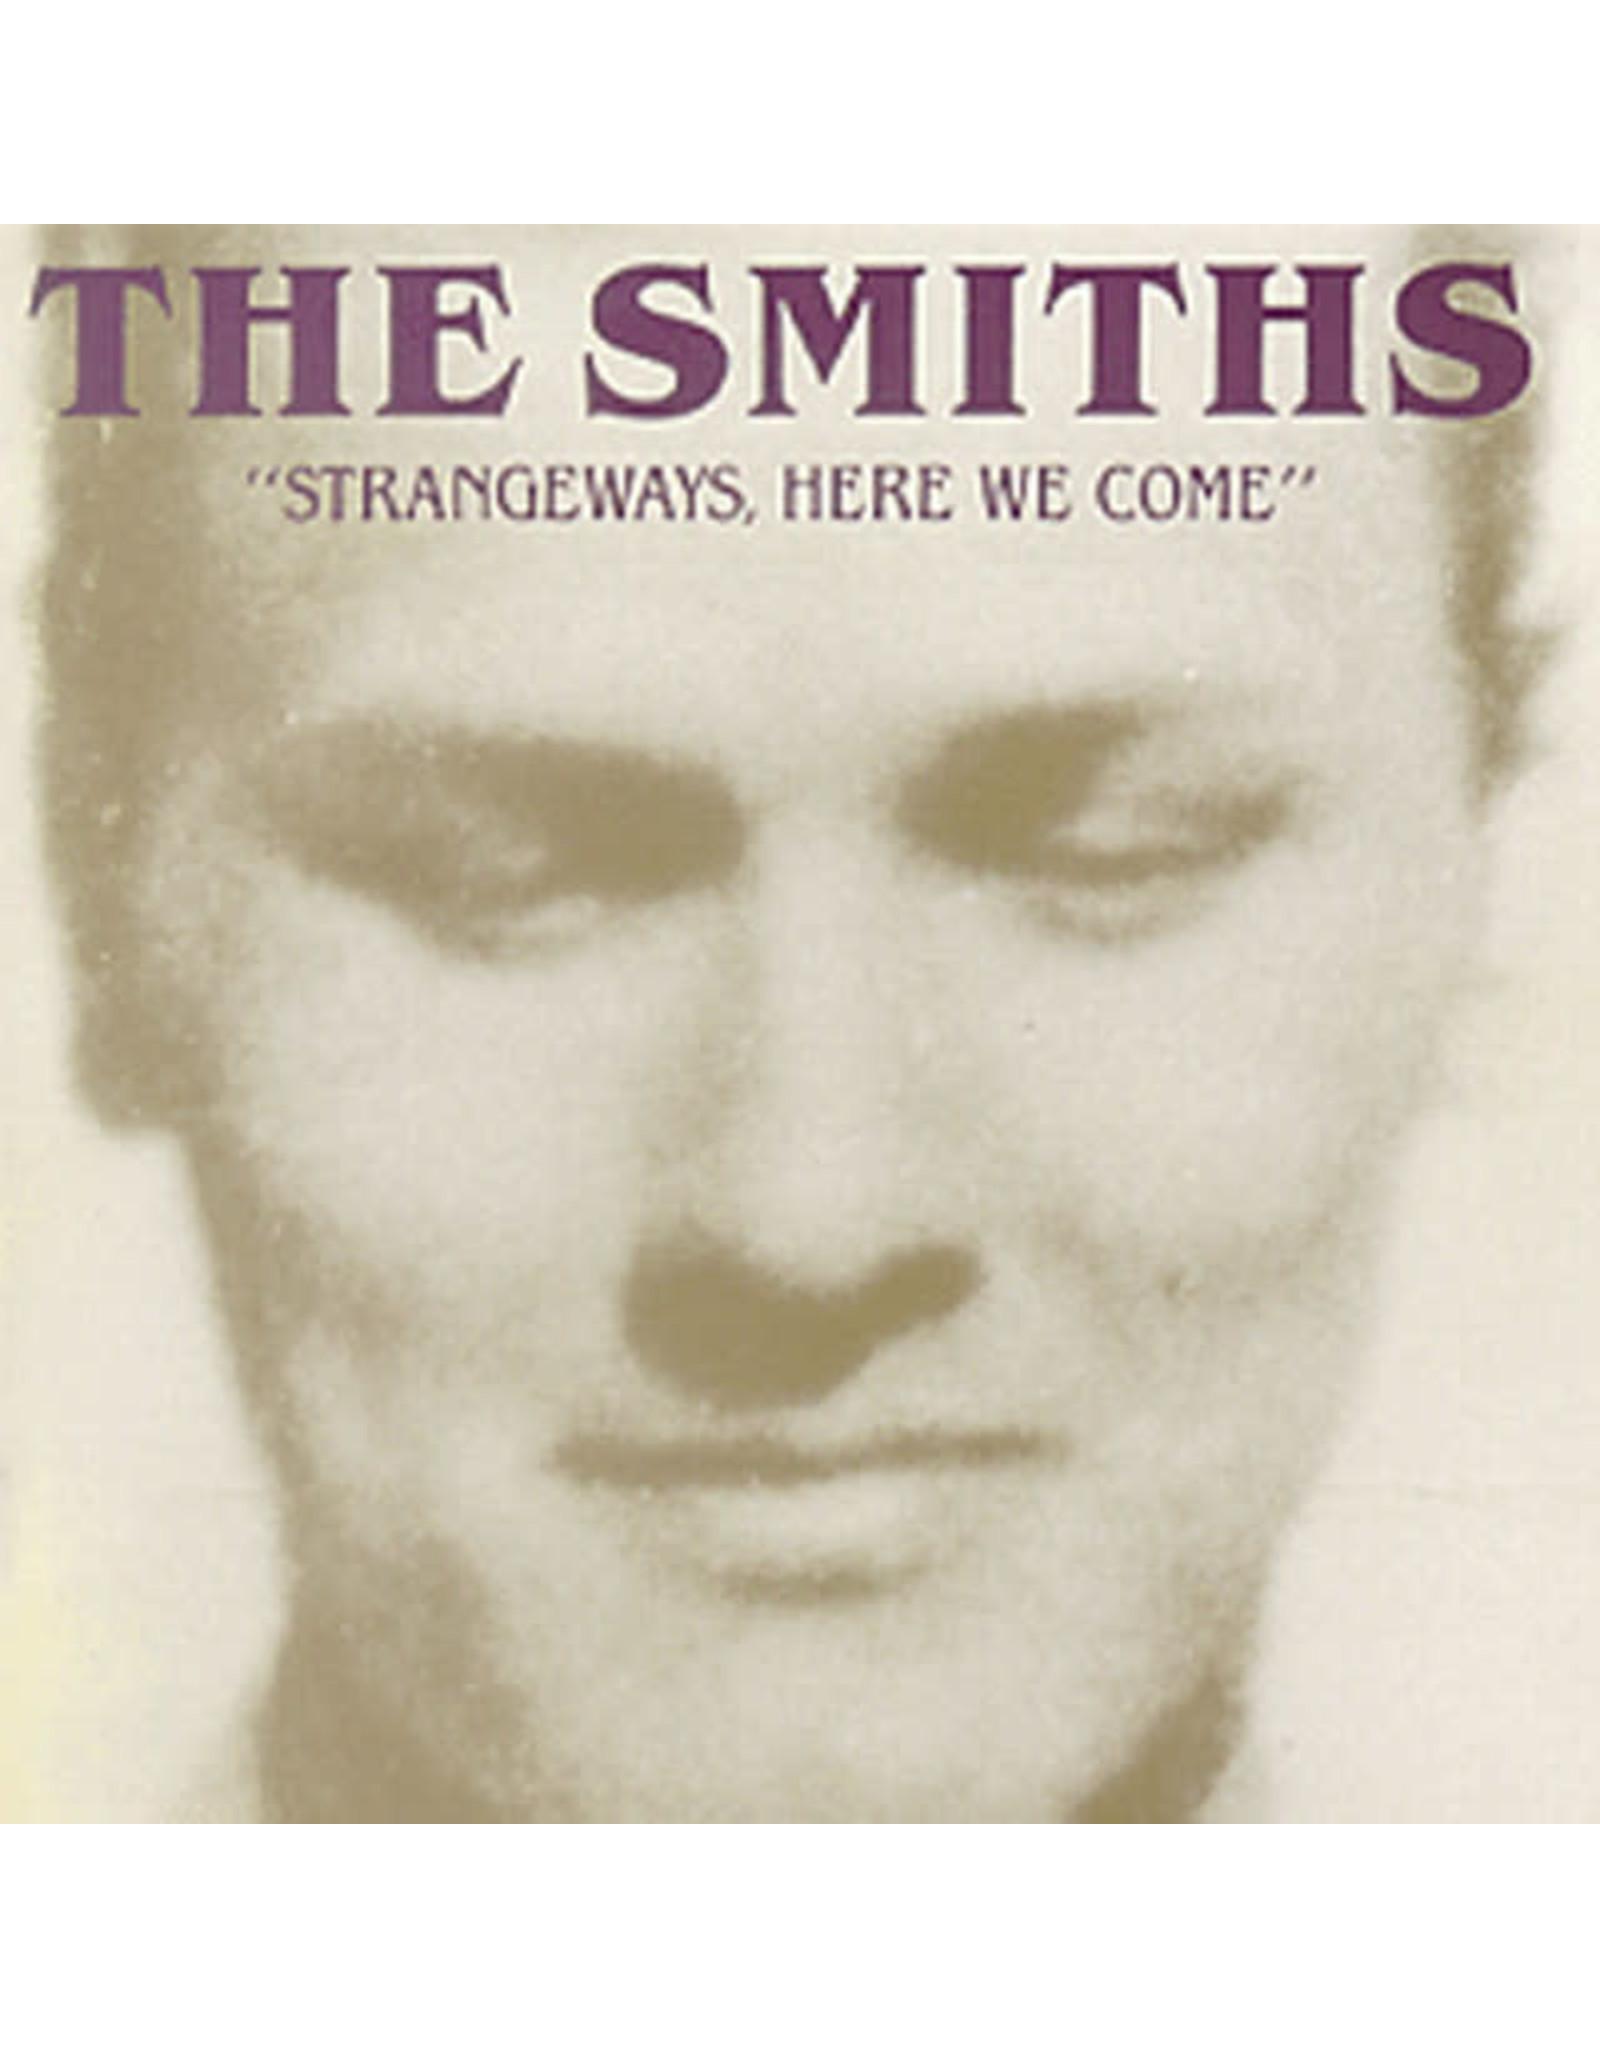 Vinyl The Smiths - Strangeways, Here We Come